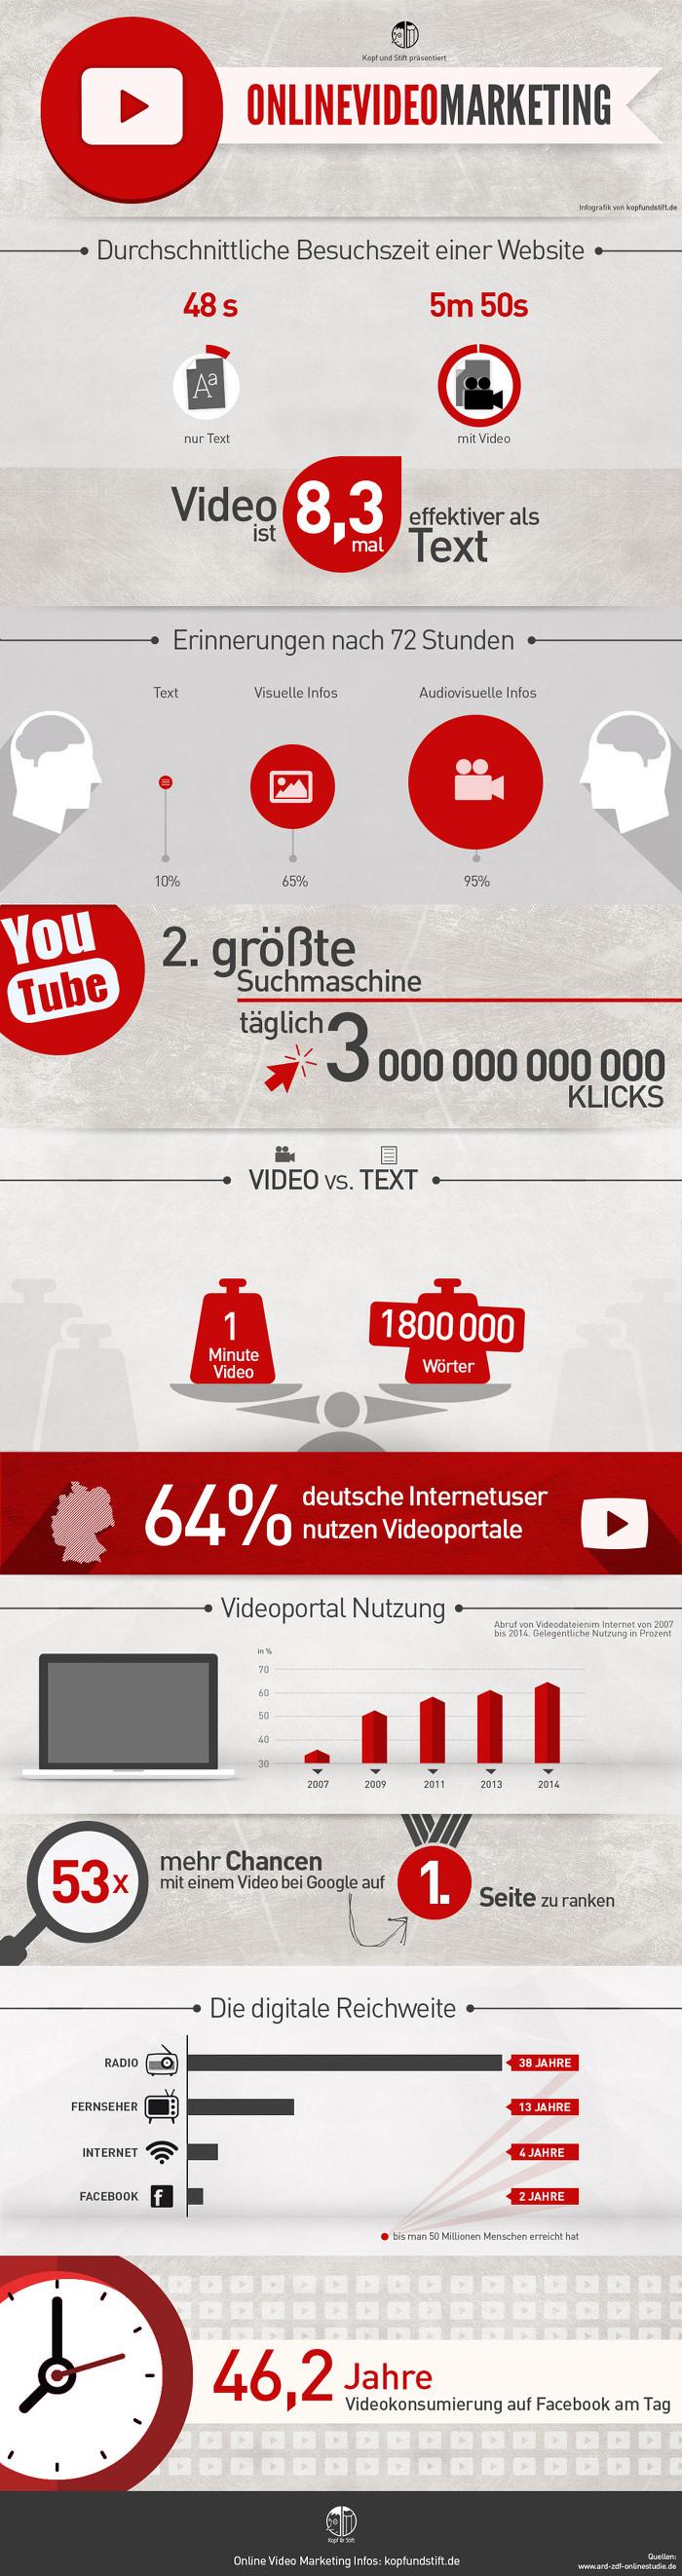 video-marketing-infografik1